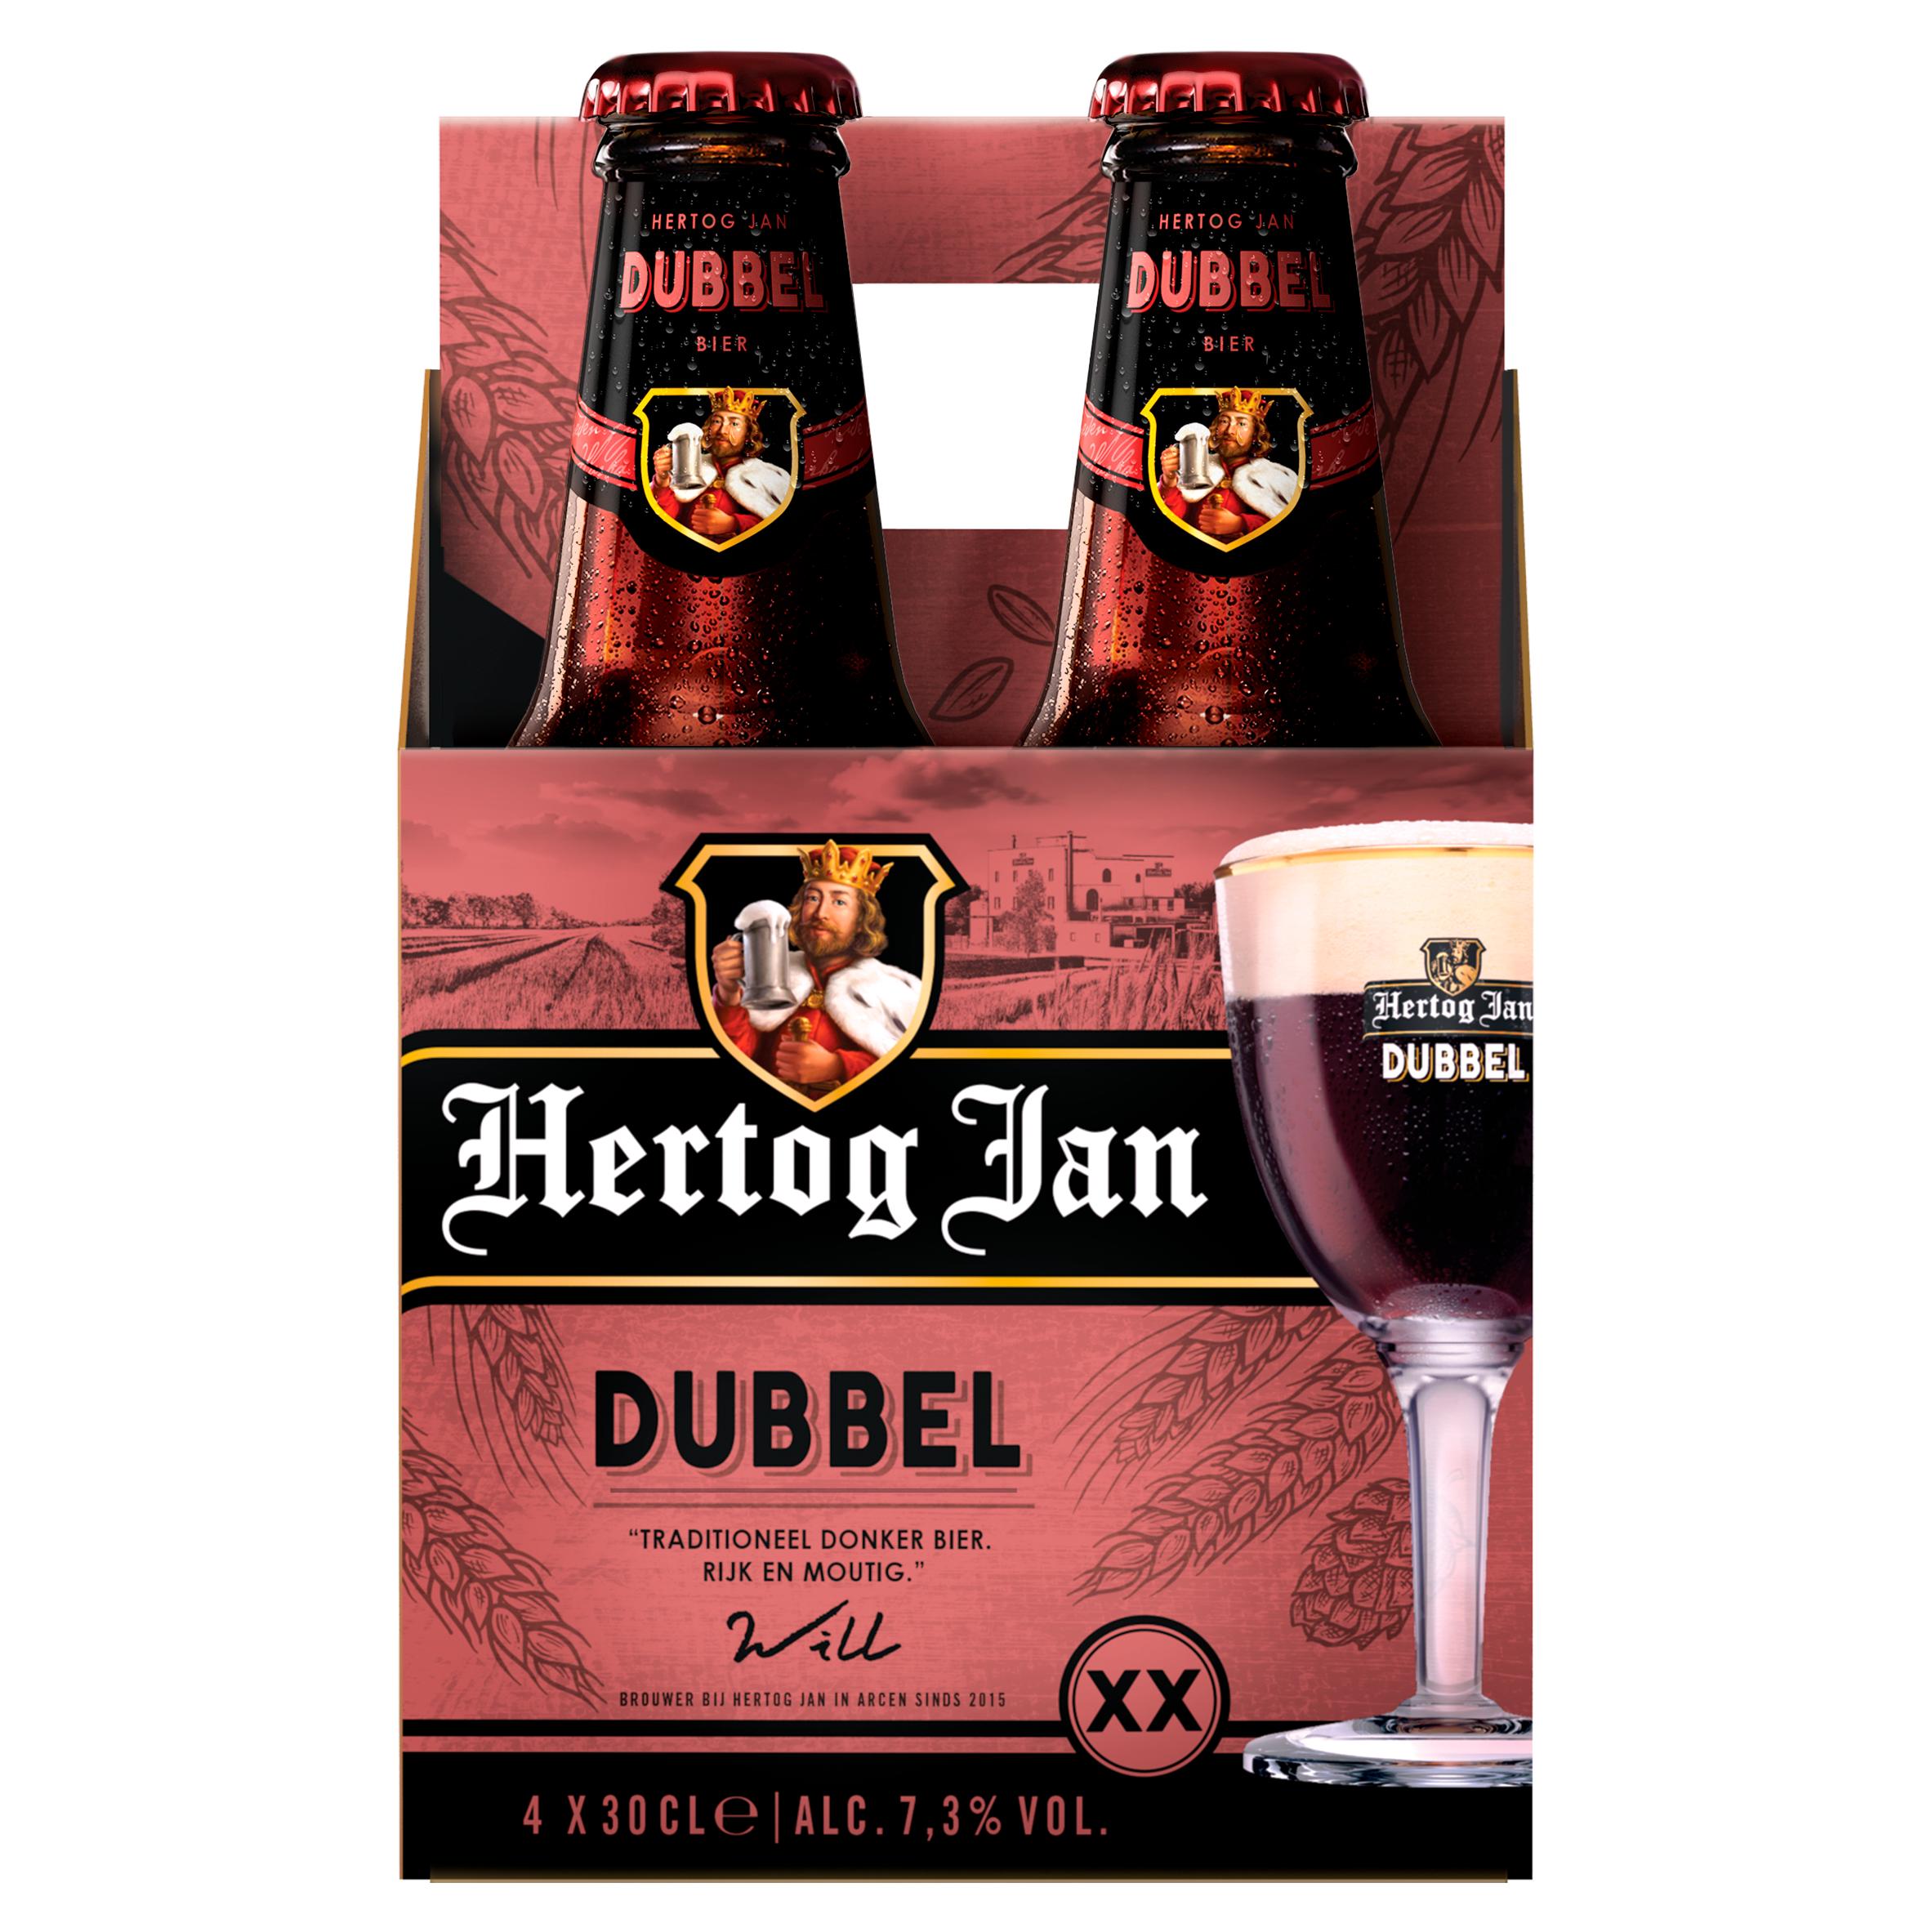 Hertog Jan Dubbel Bier Flessen 4 x 30 cl